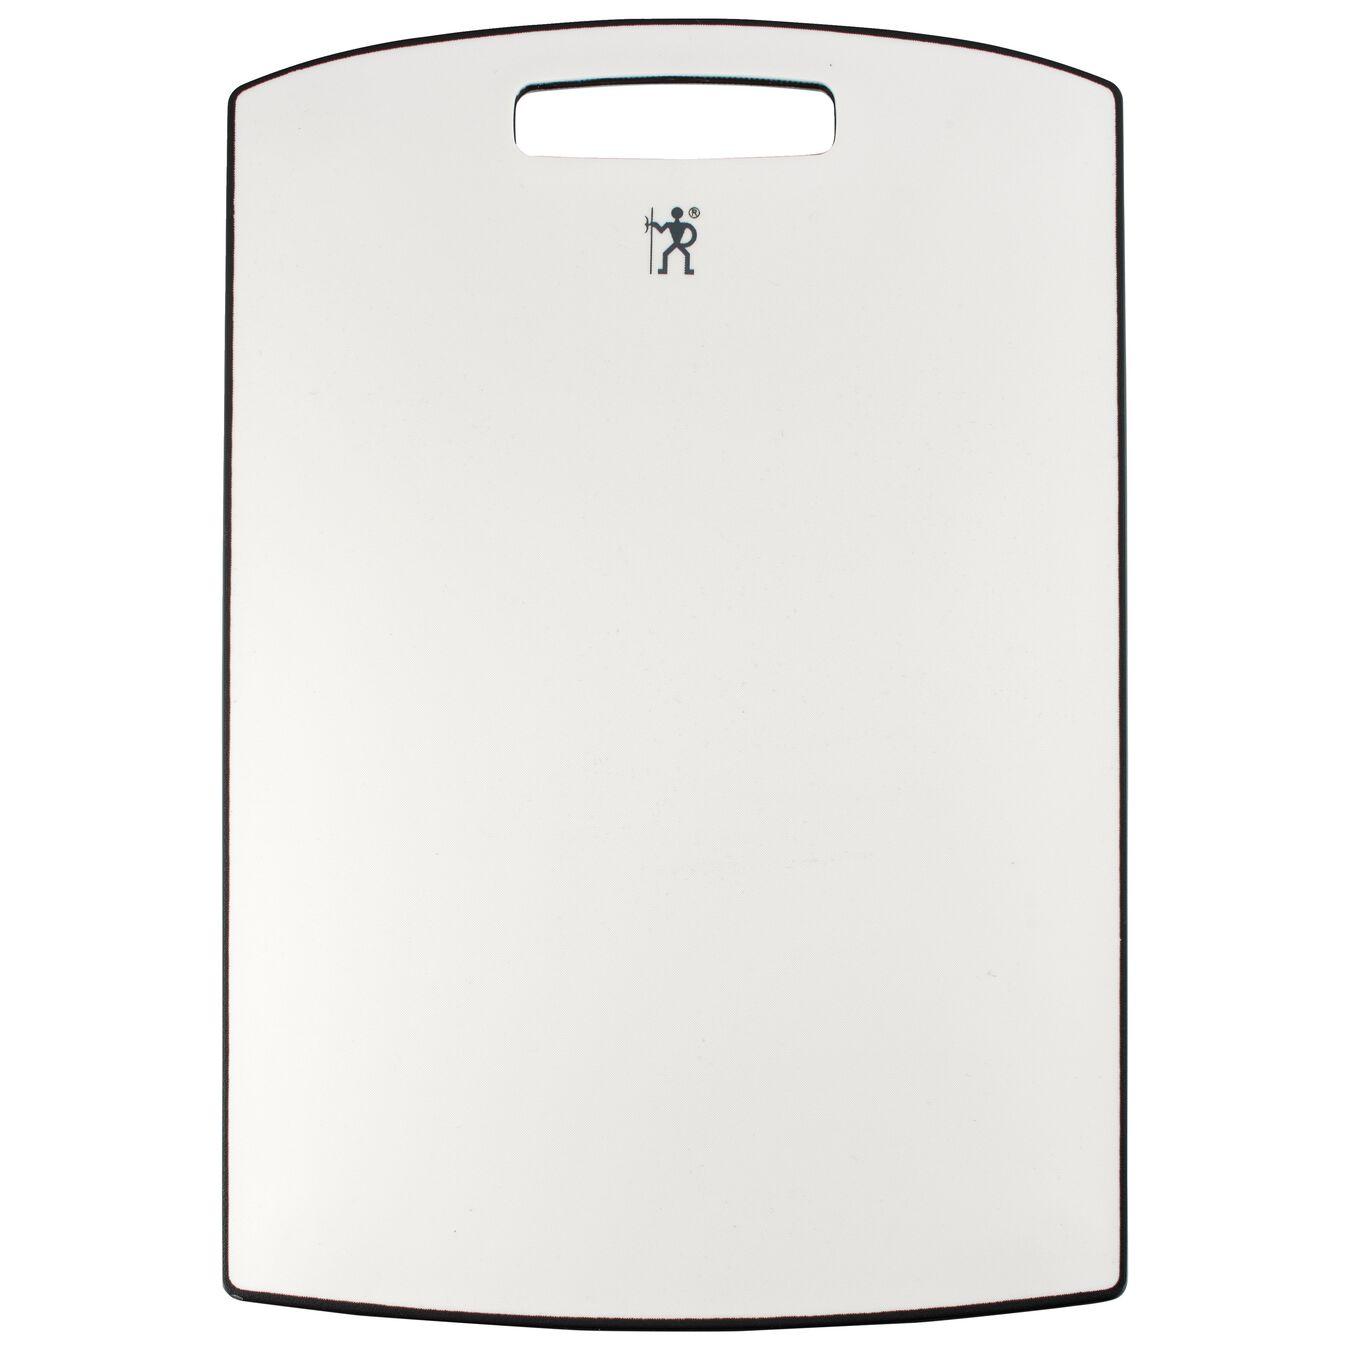 10-inch x 1-inch Medium White Cutting Board - Gray Border, PP ,,large 1